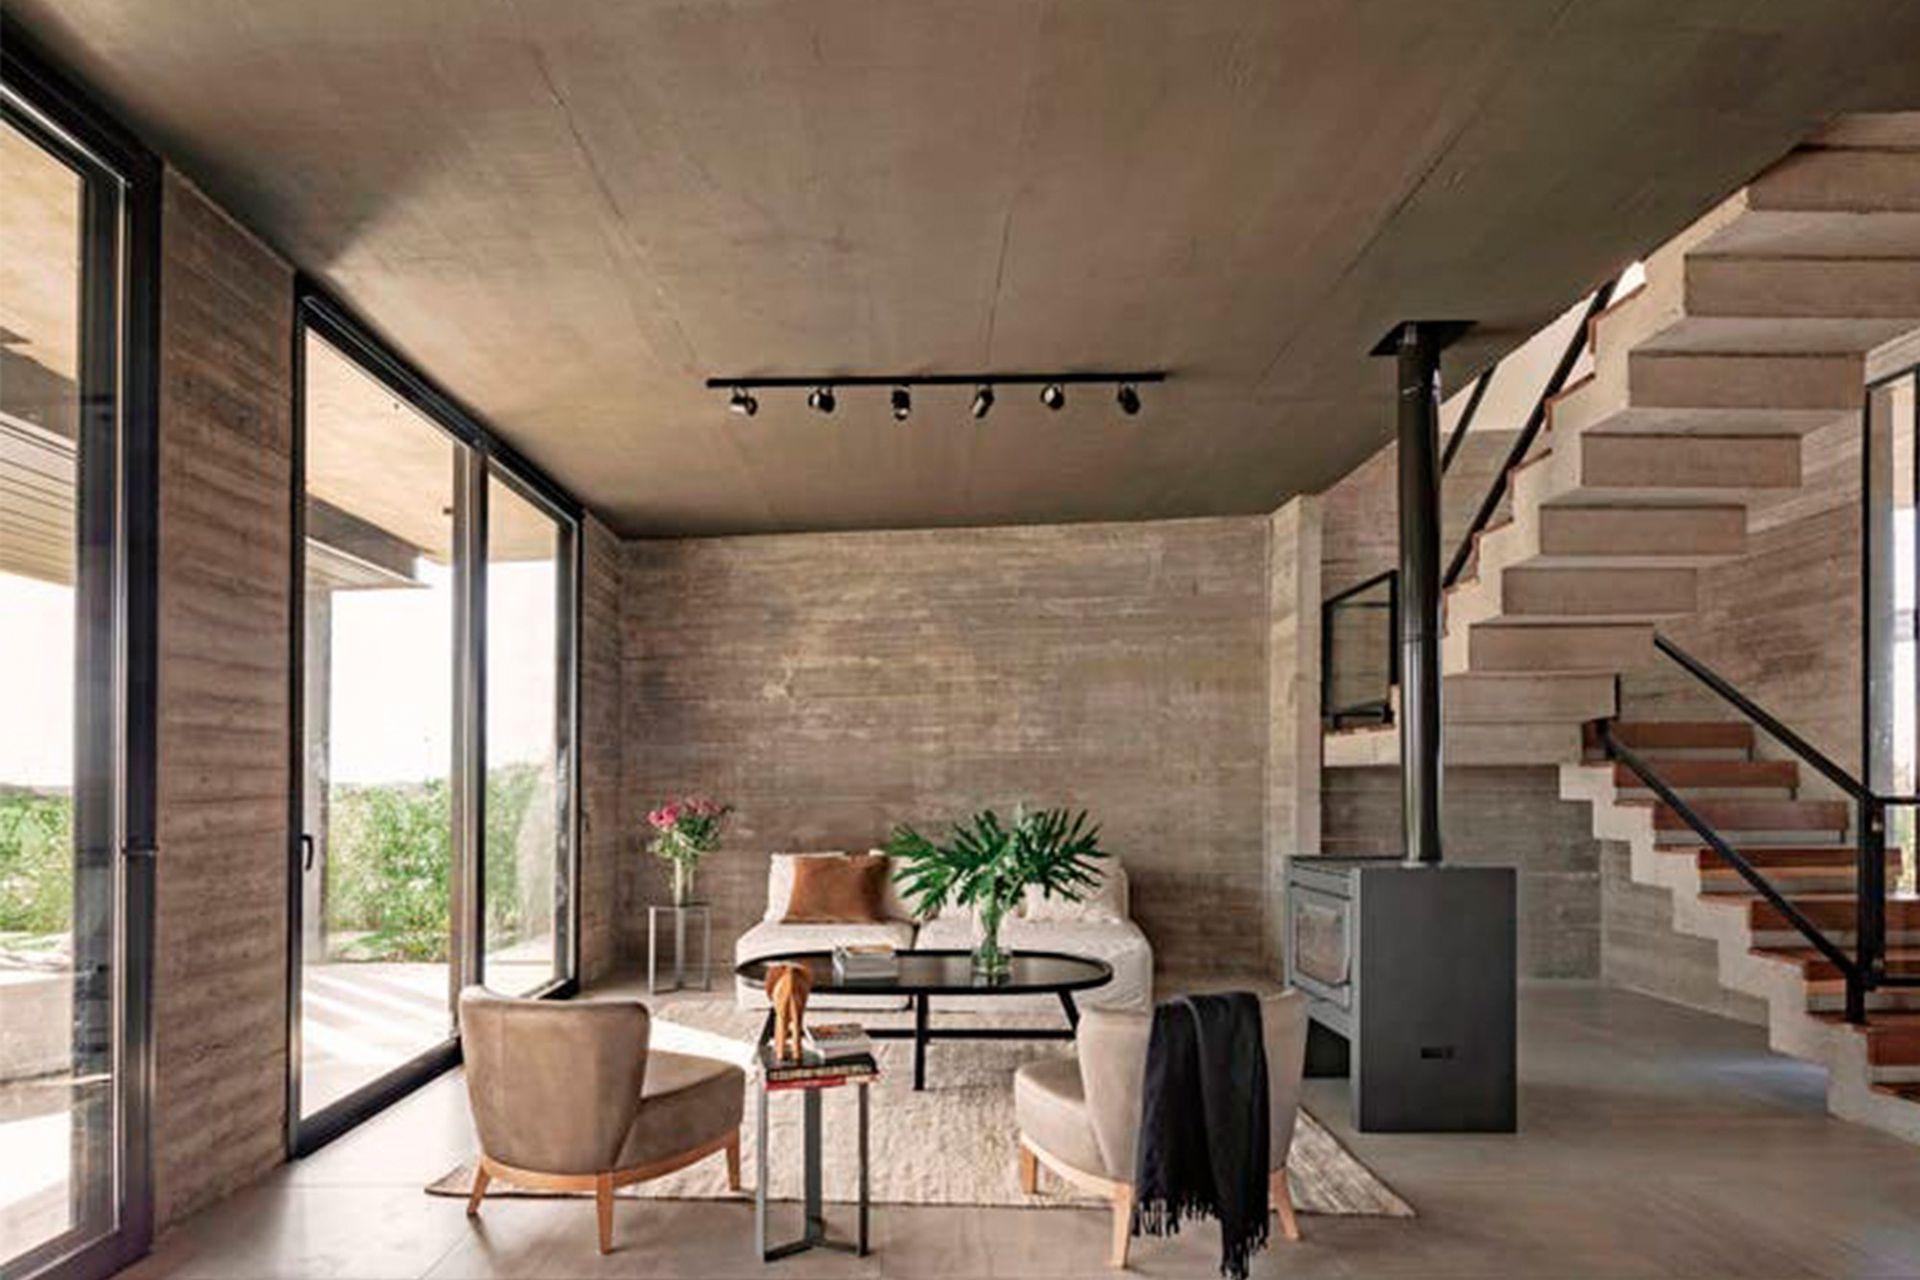 Sillones individuales, mesa de arrime, de centro y sofá (todo, BAM! Arquitectura) con funda en tussor (Casa Almacén). Alfombra (Awanay).